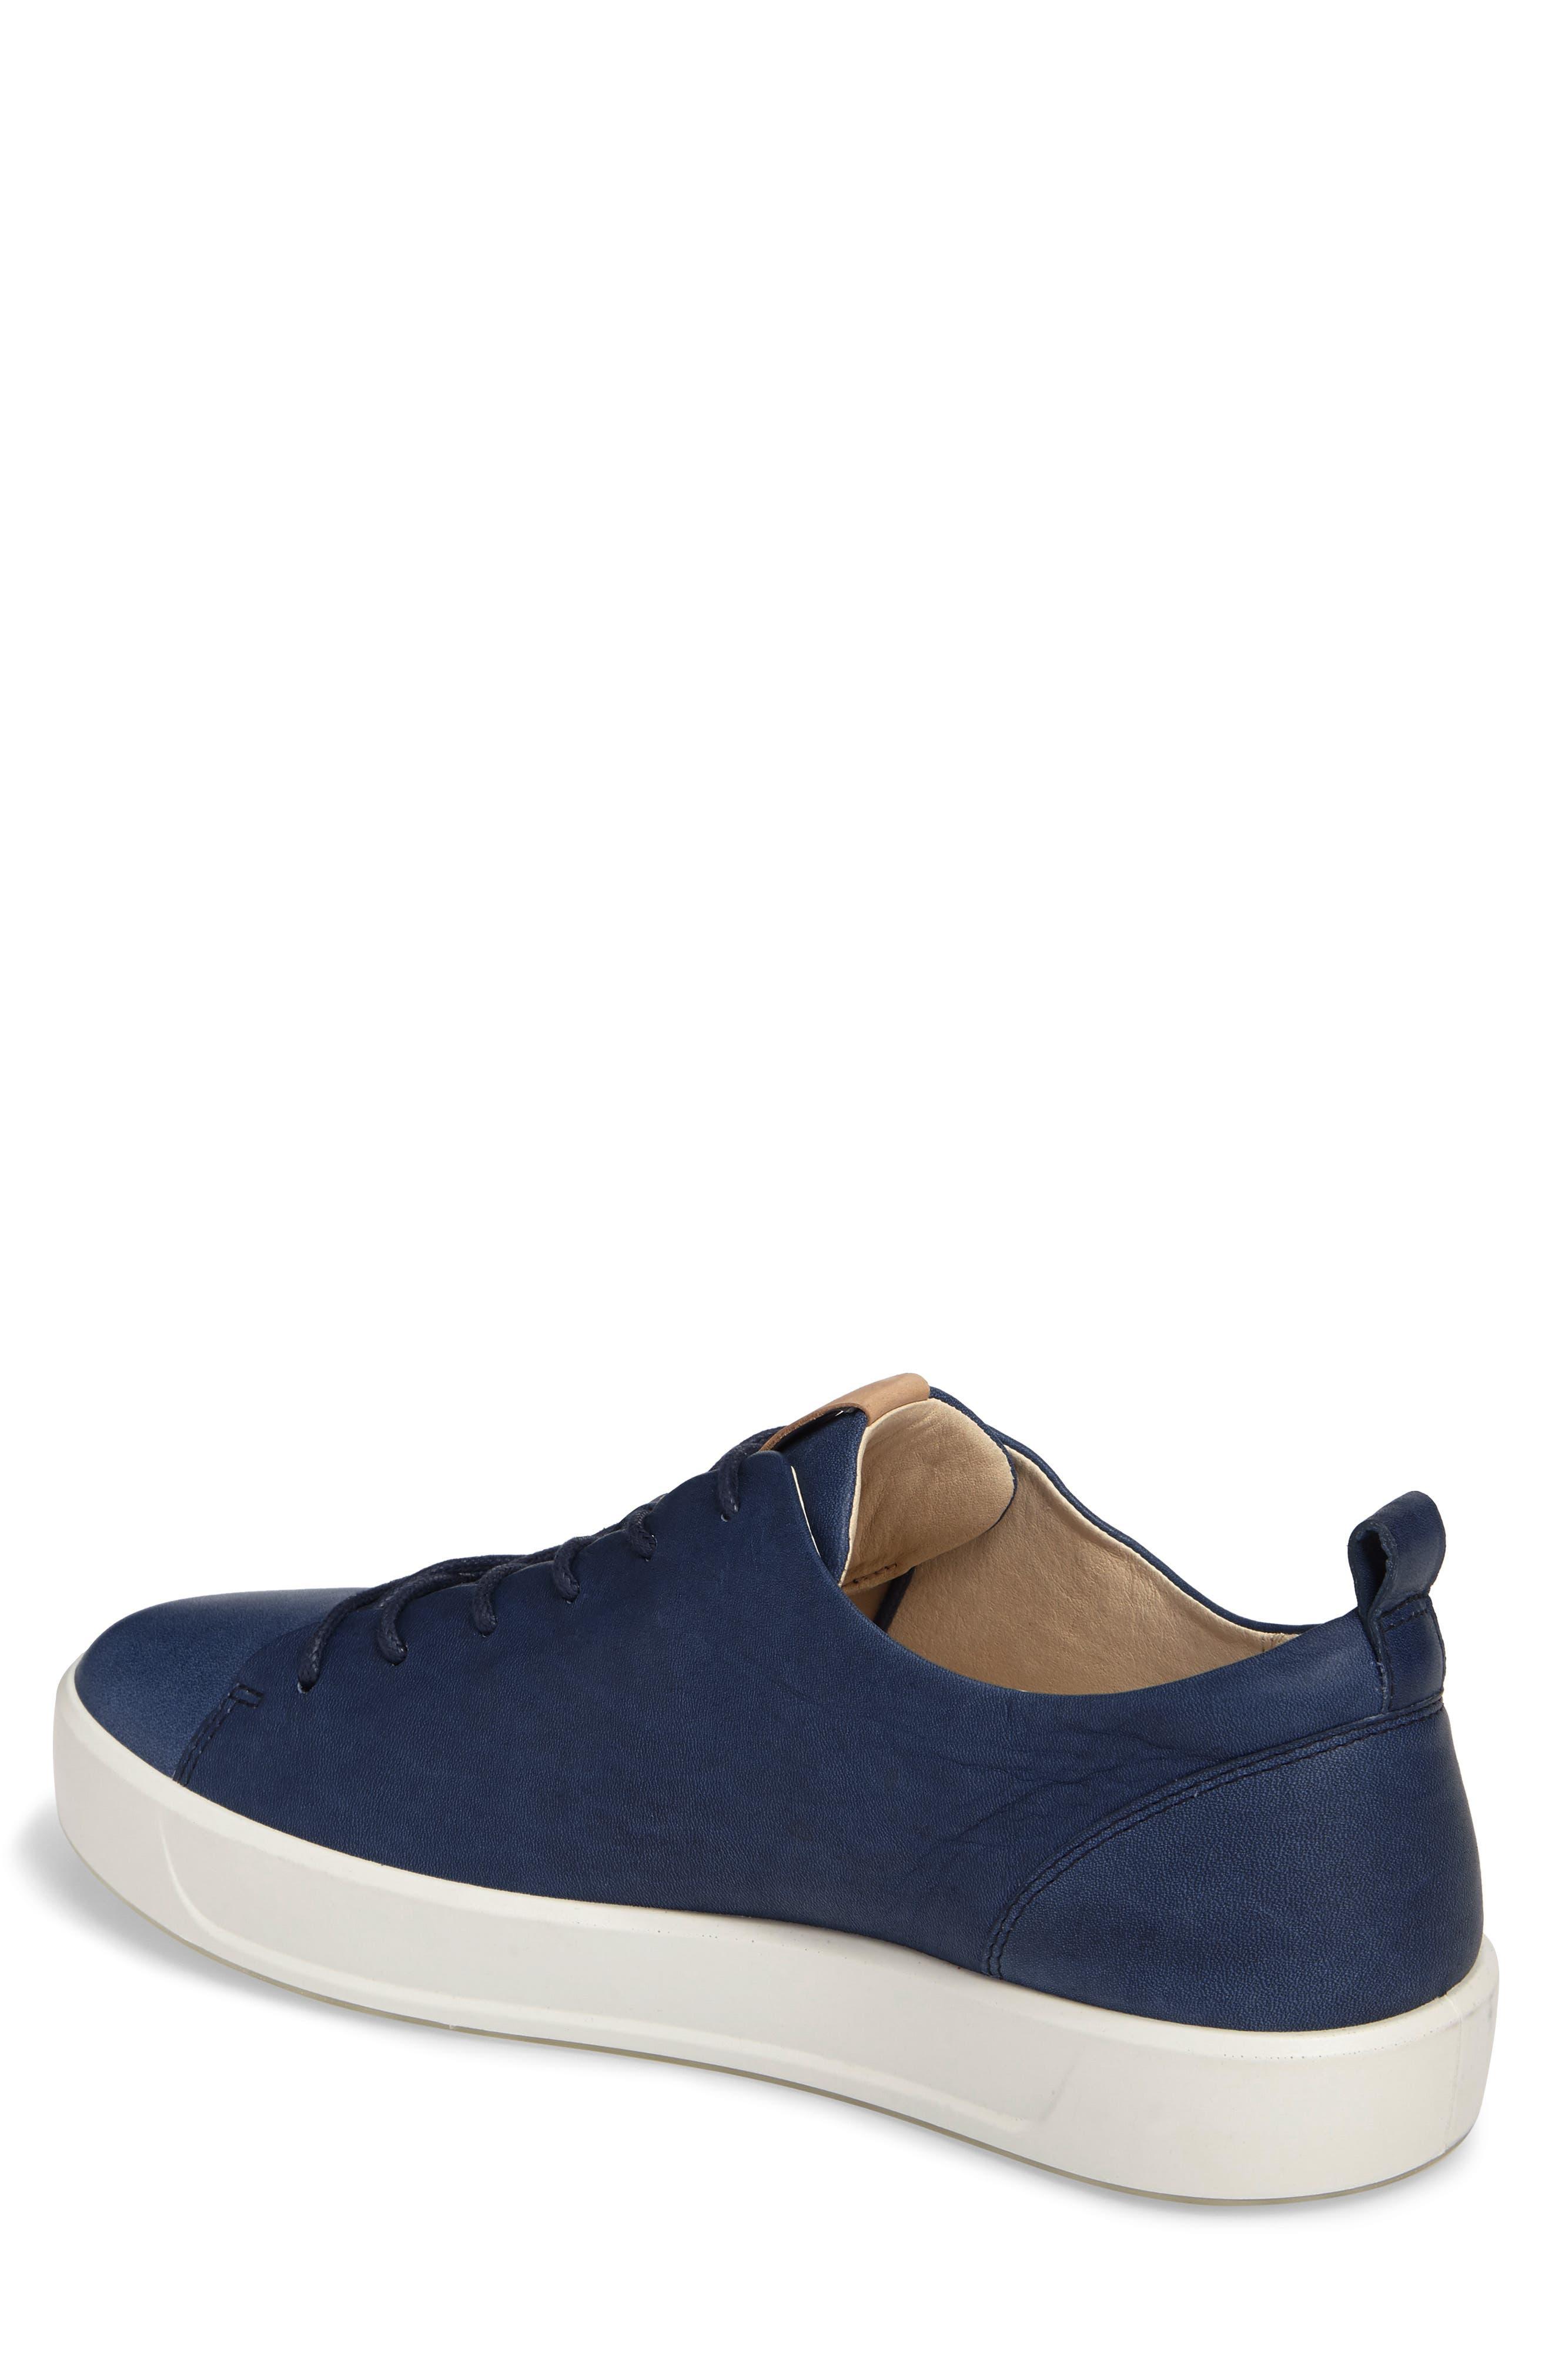 Soft 8 Sneaker,                             Alternate thumbnail 2, color,                             INDIGO 7 LEATHER